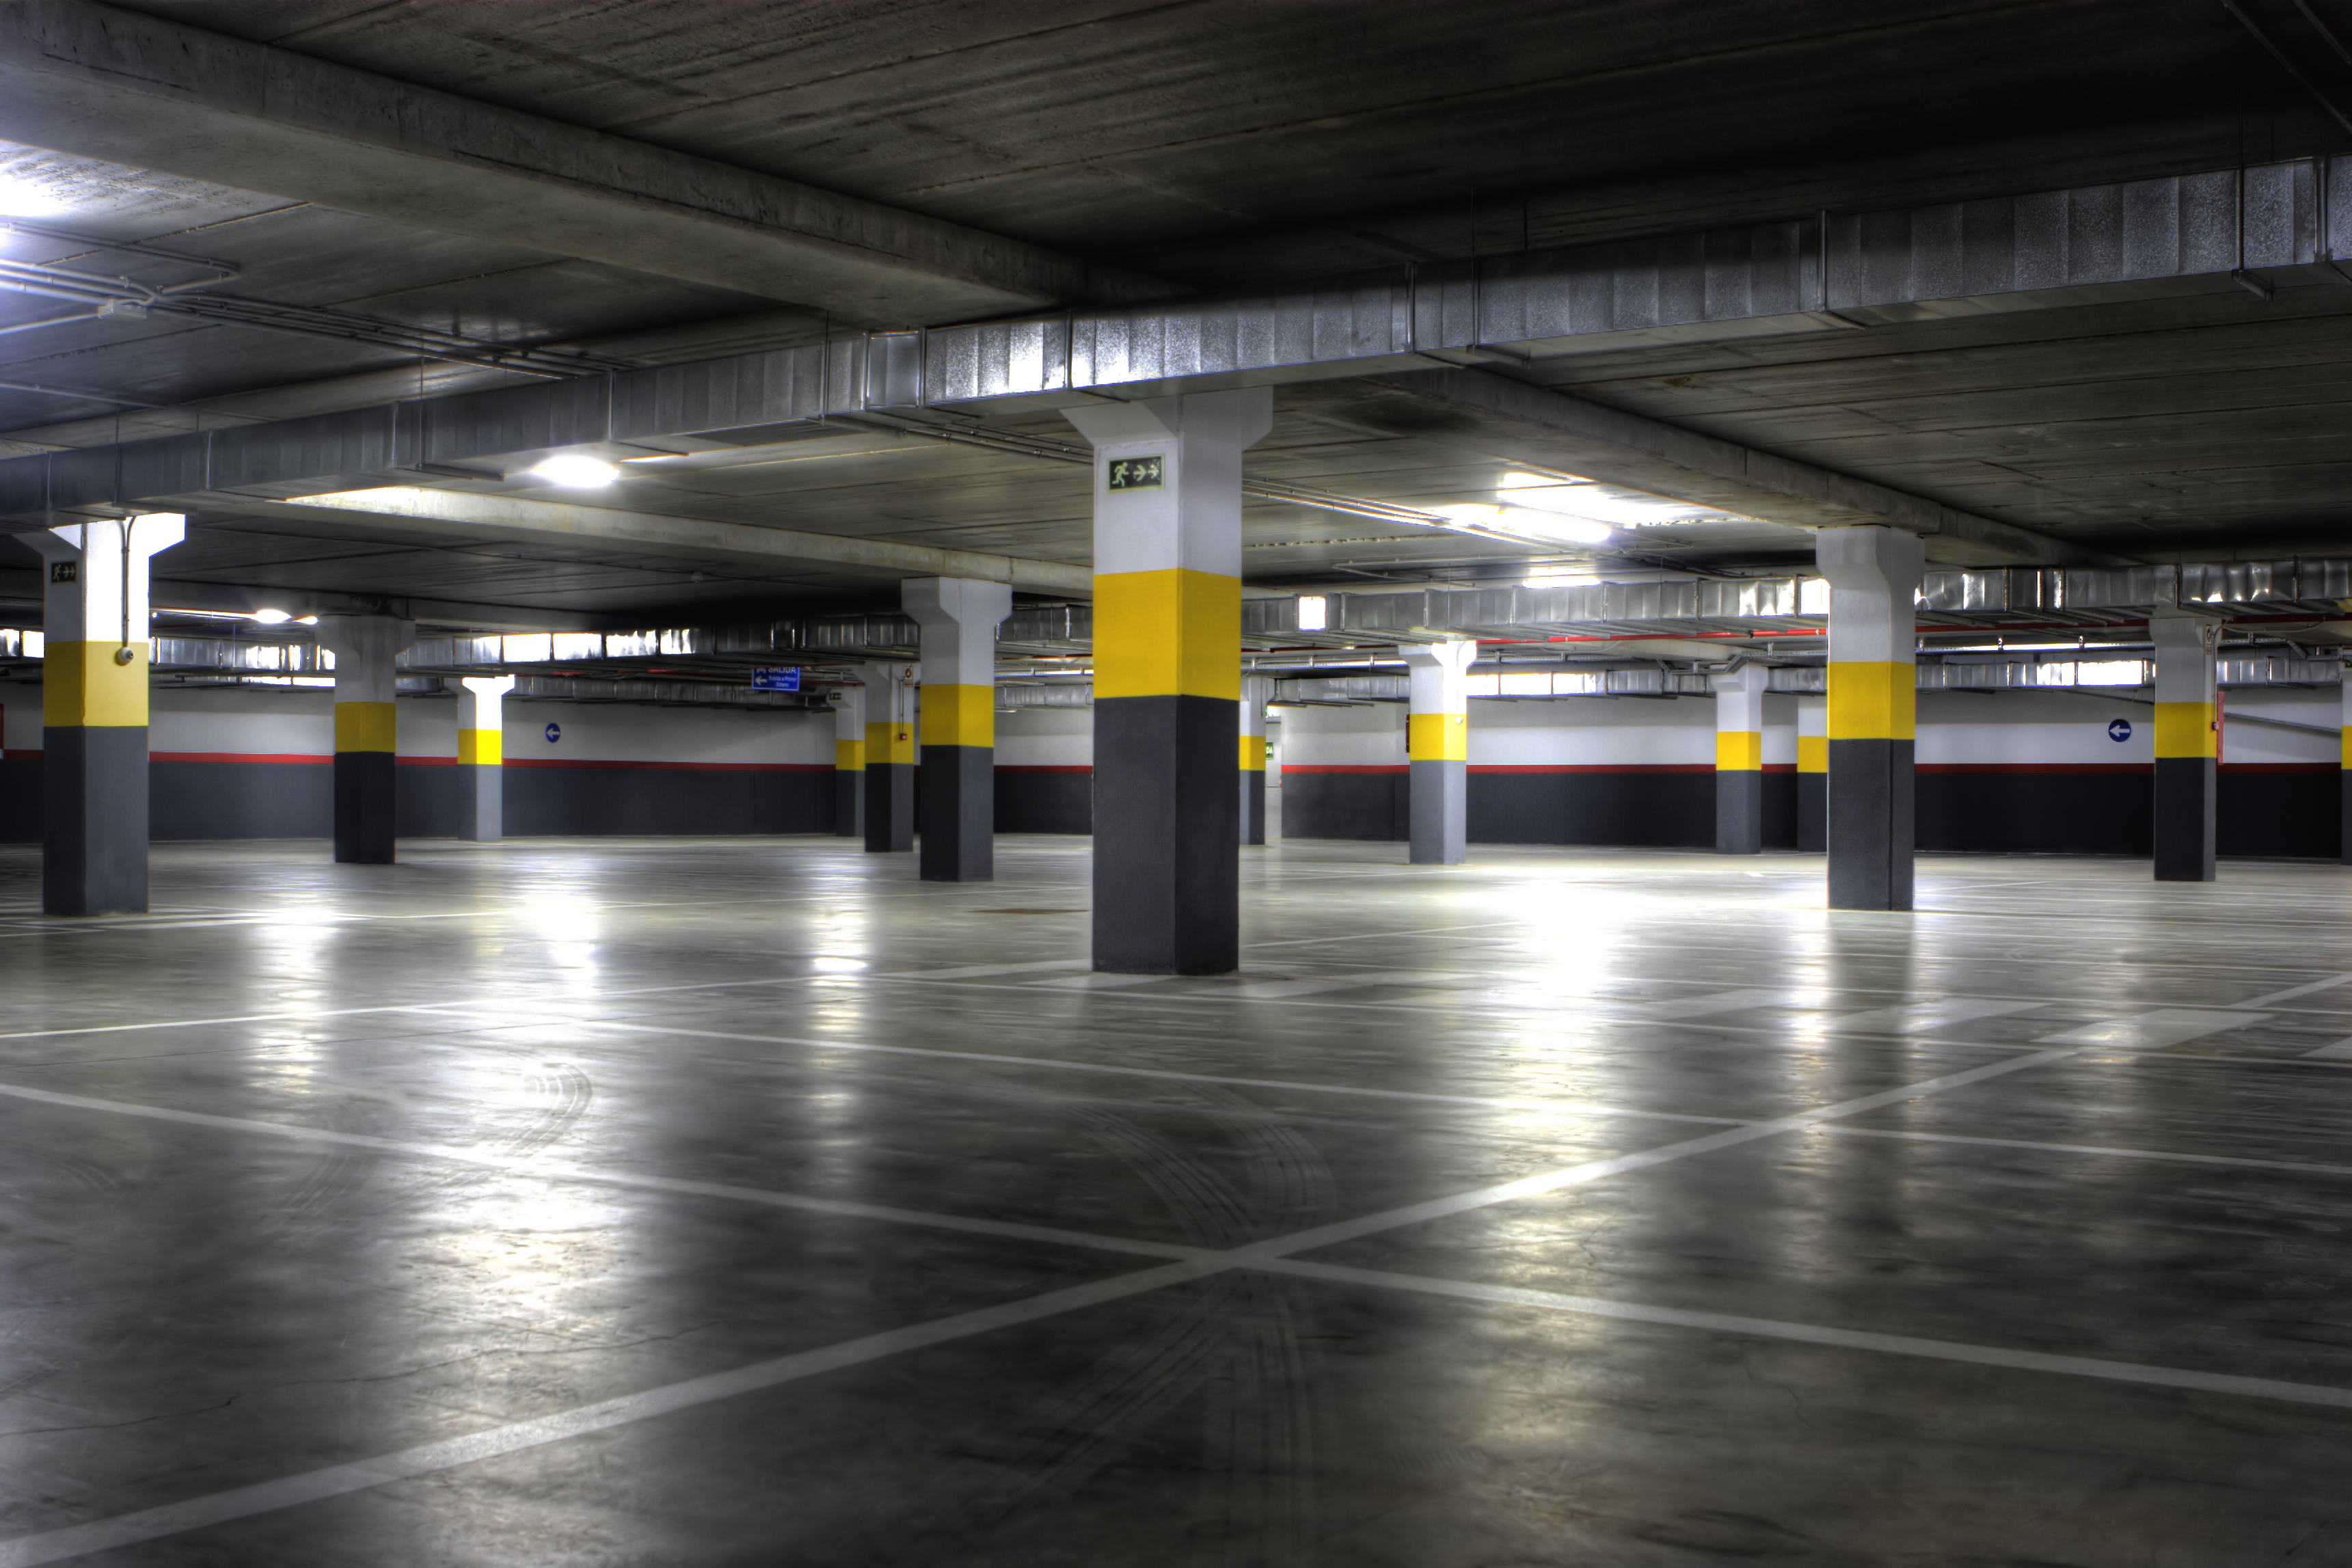 High Pressure Cleaning Gold Coast Basement Carpark 2